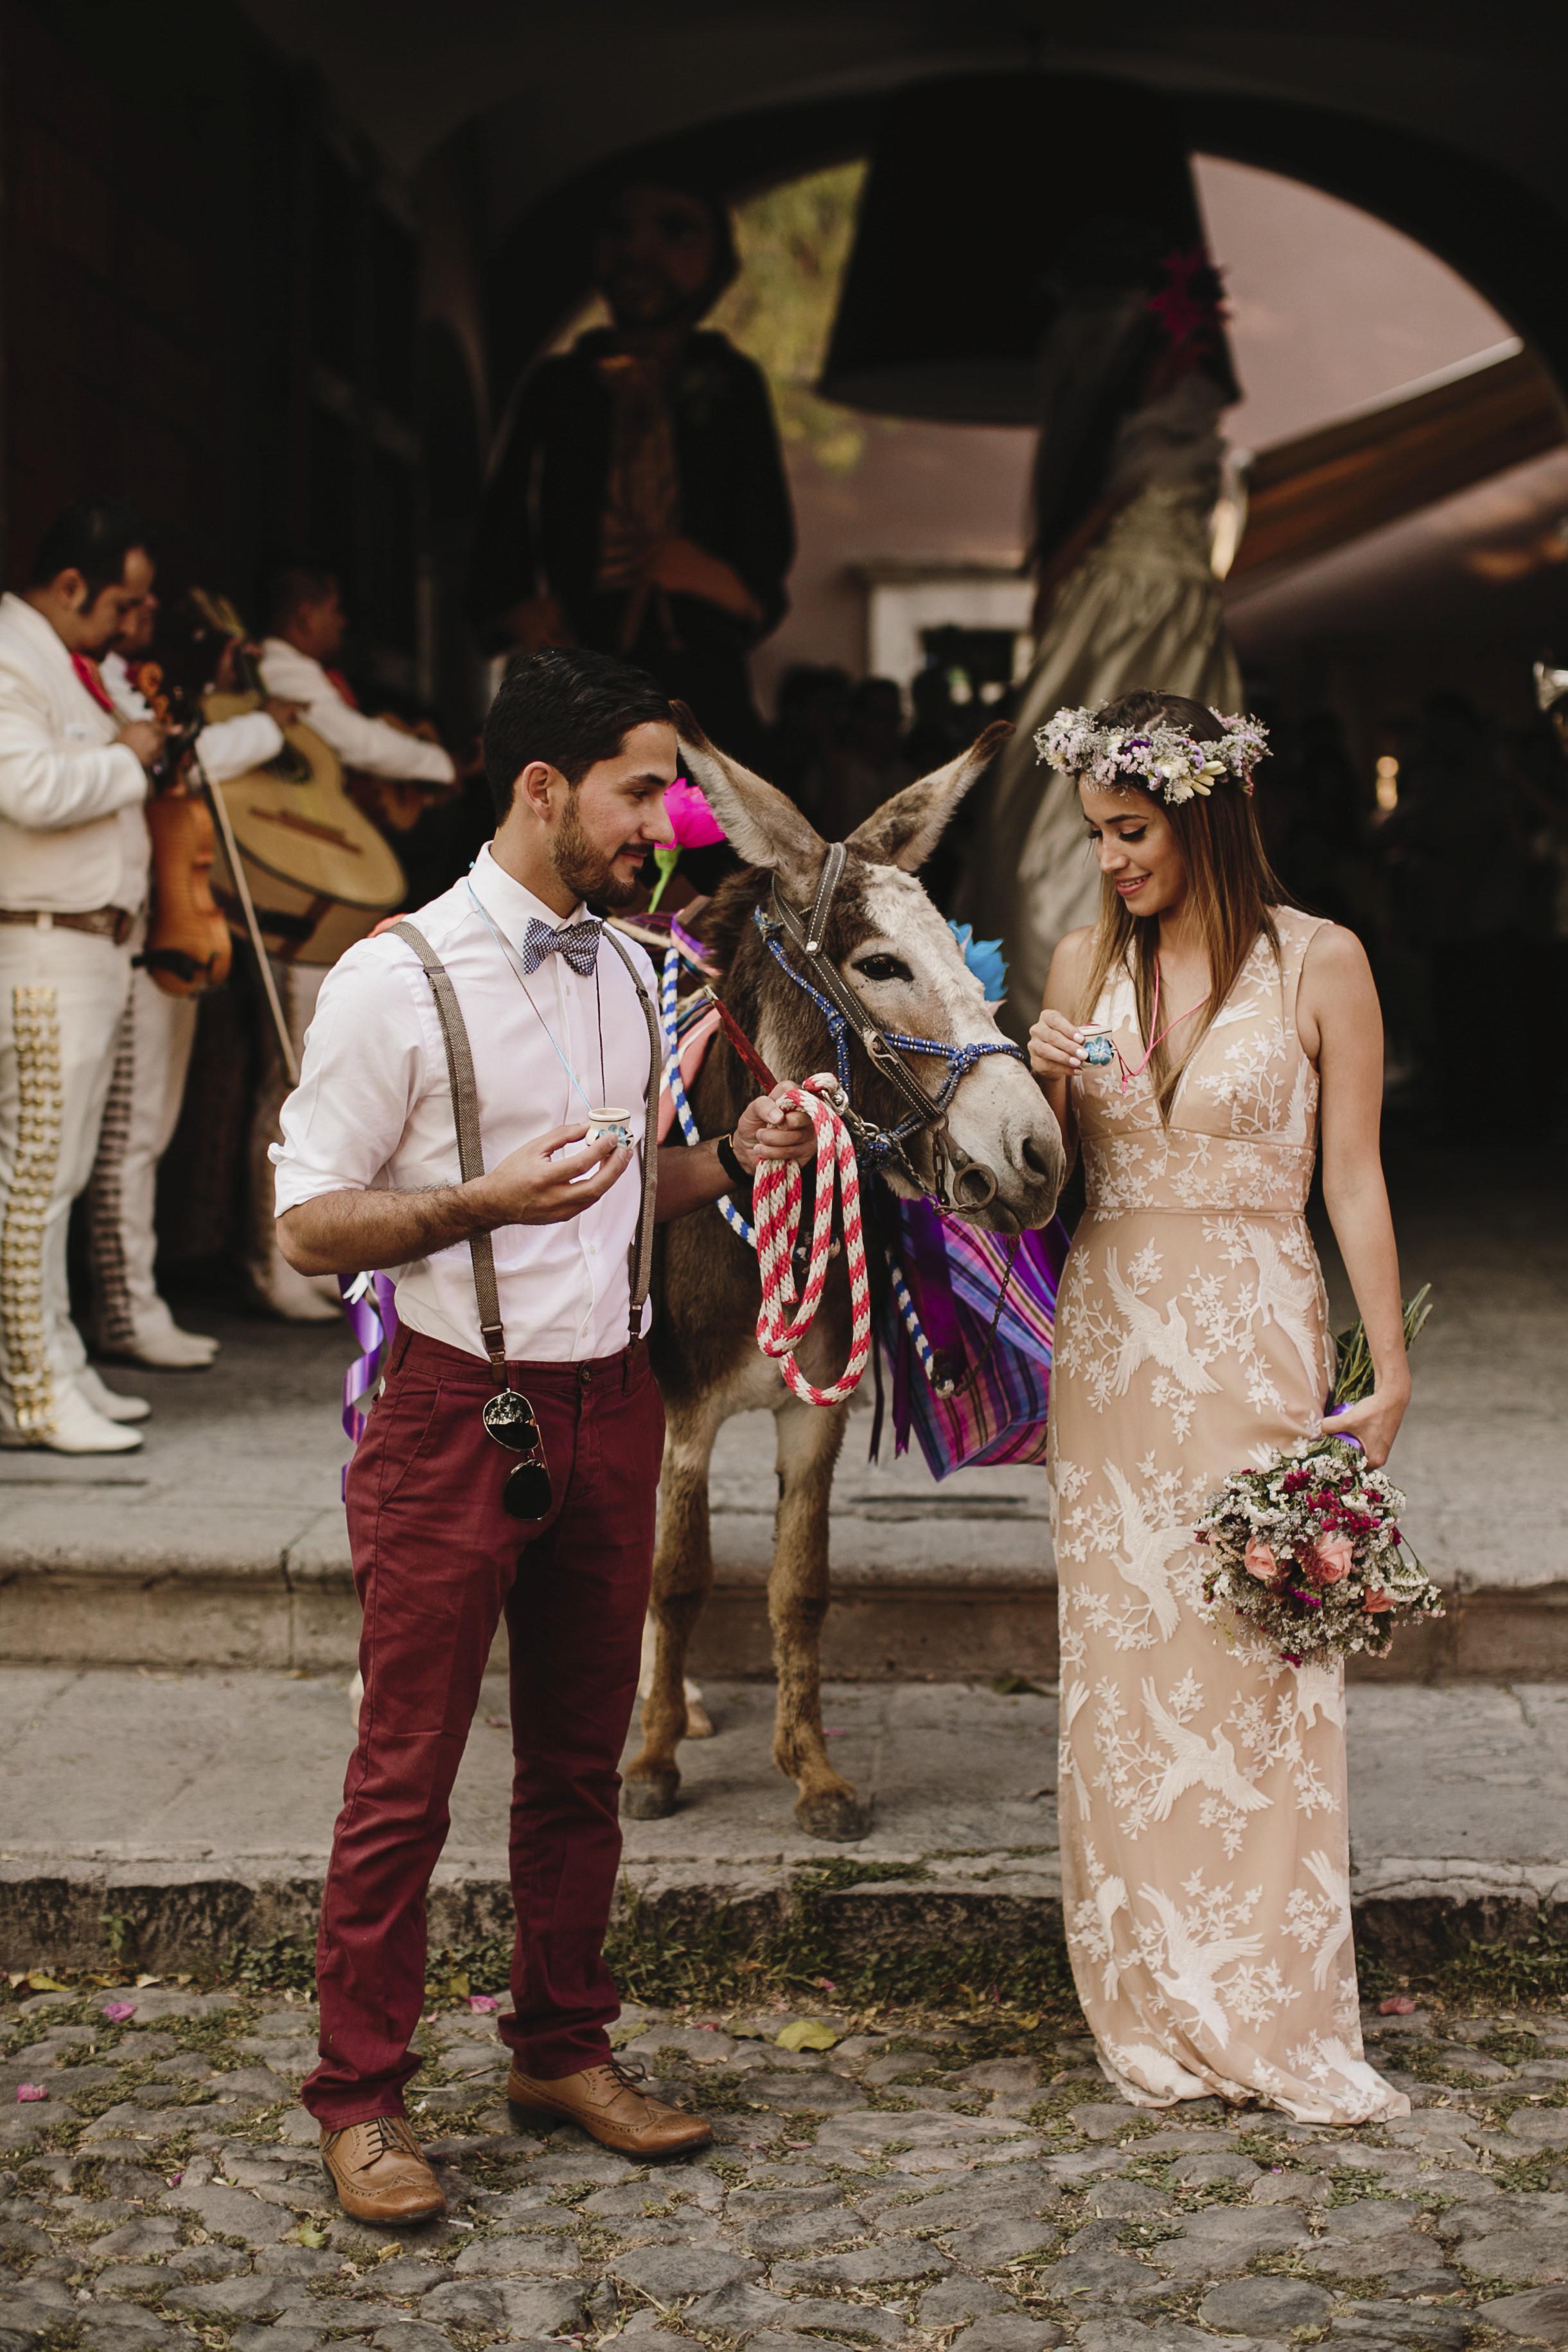 alfons_flores_destination_wedding_photography_mavi_david-277.JPG